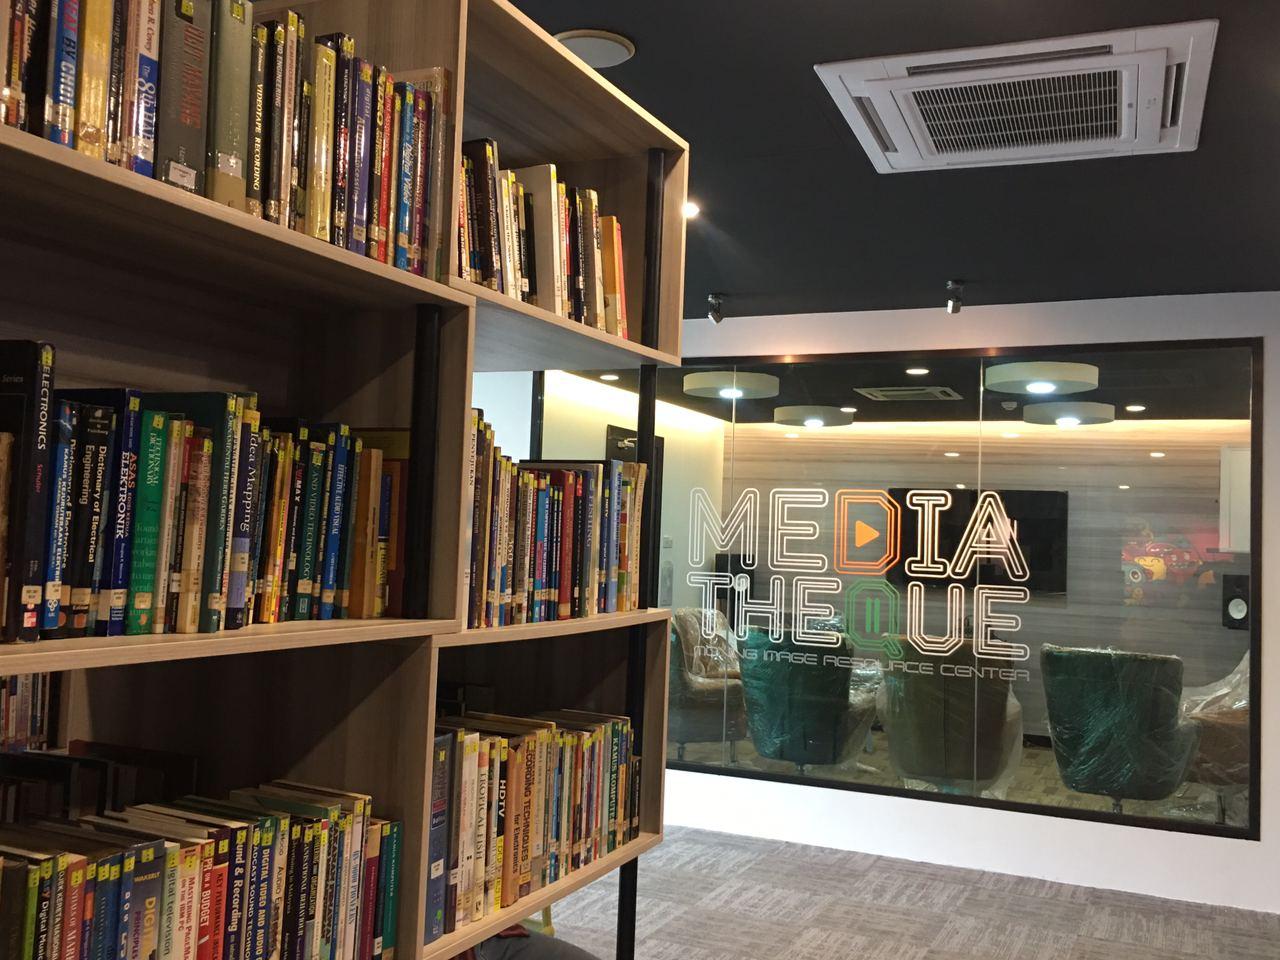 FINAS Mediatheque